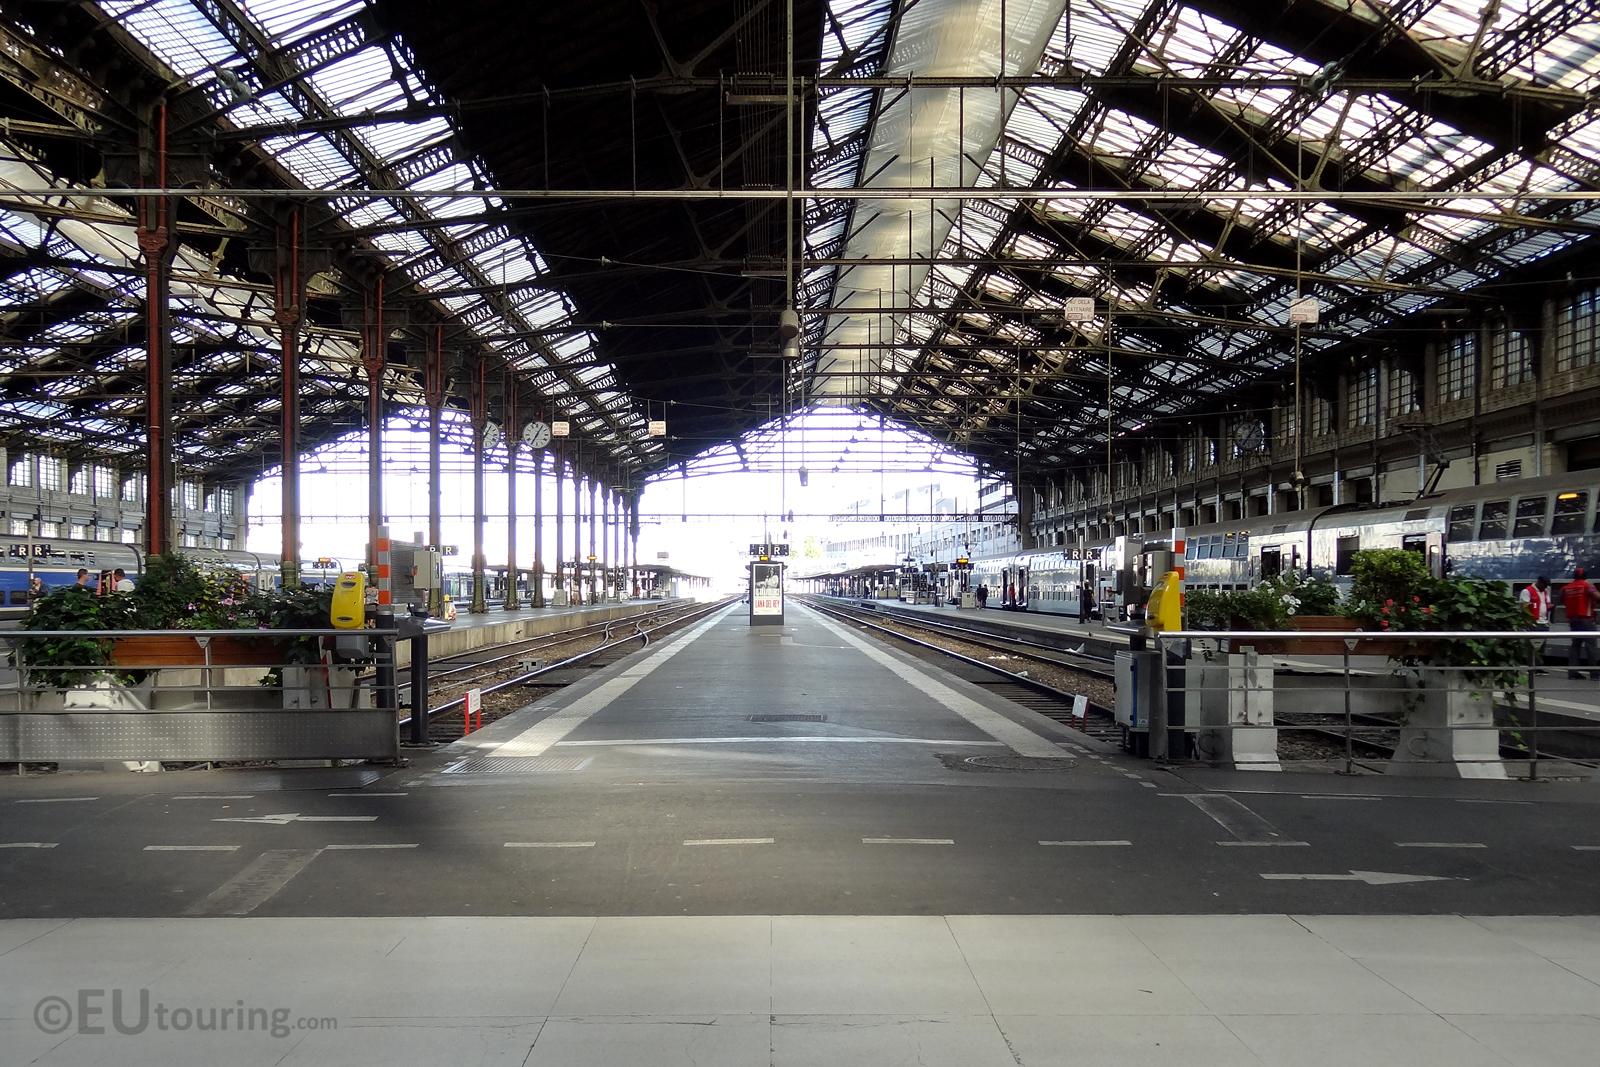 Gare de Lyon platforms